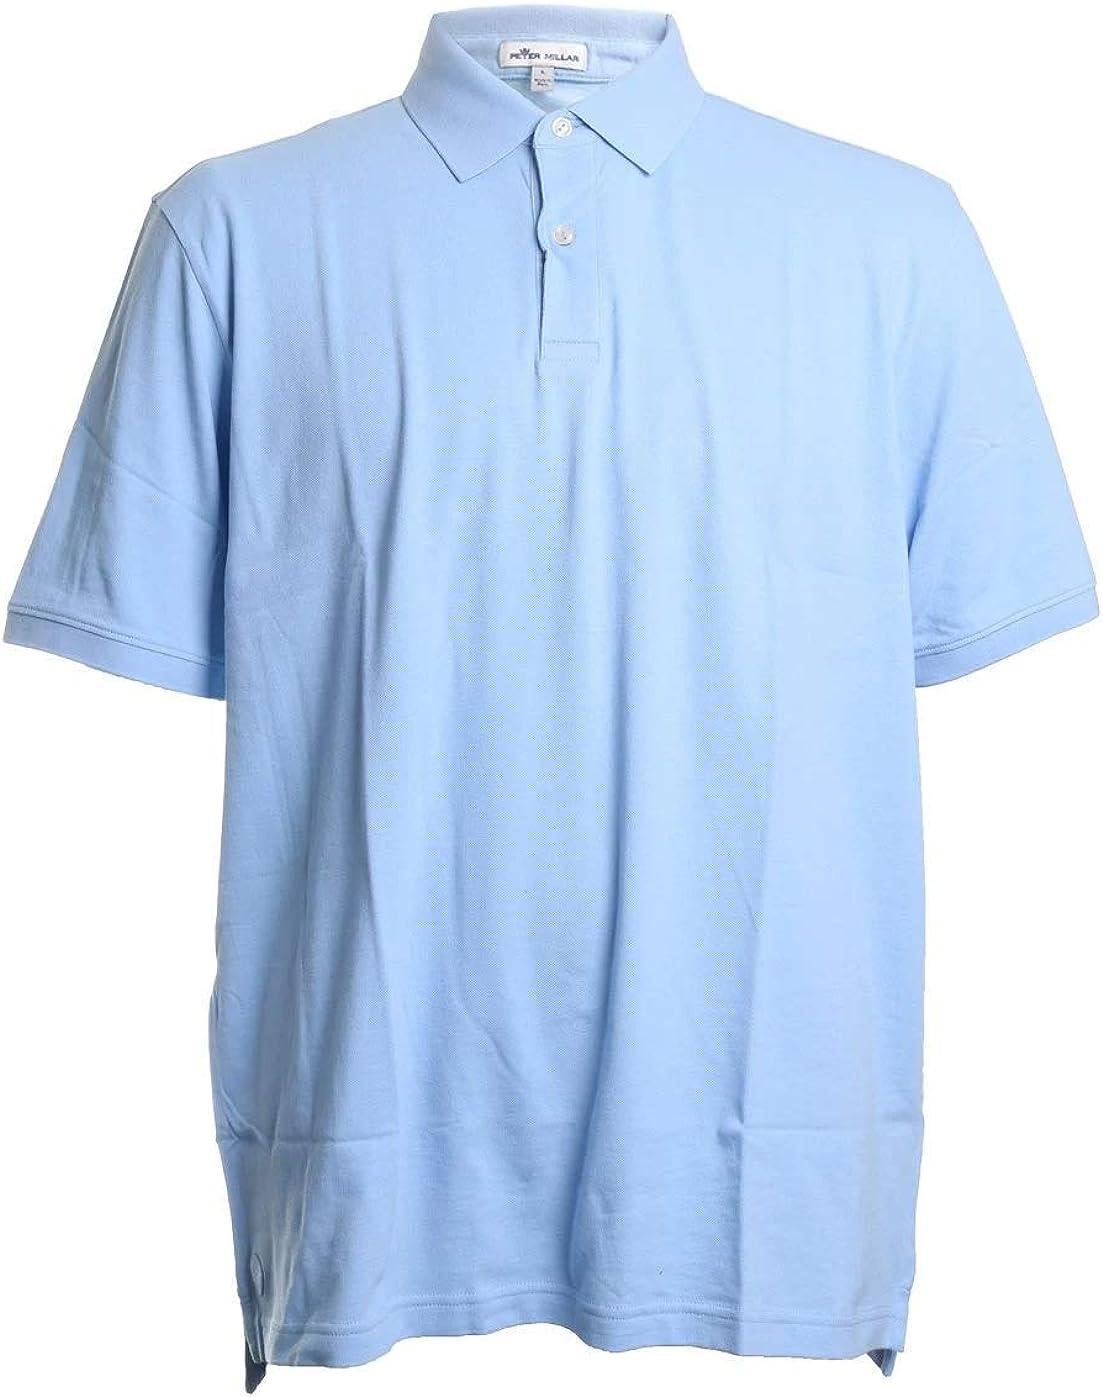 PETER MILLAR Crown Classic Pique Cotton Polo Shirt